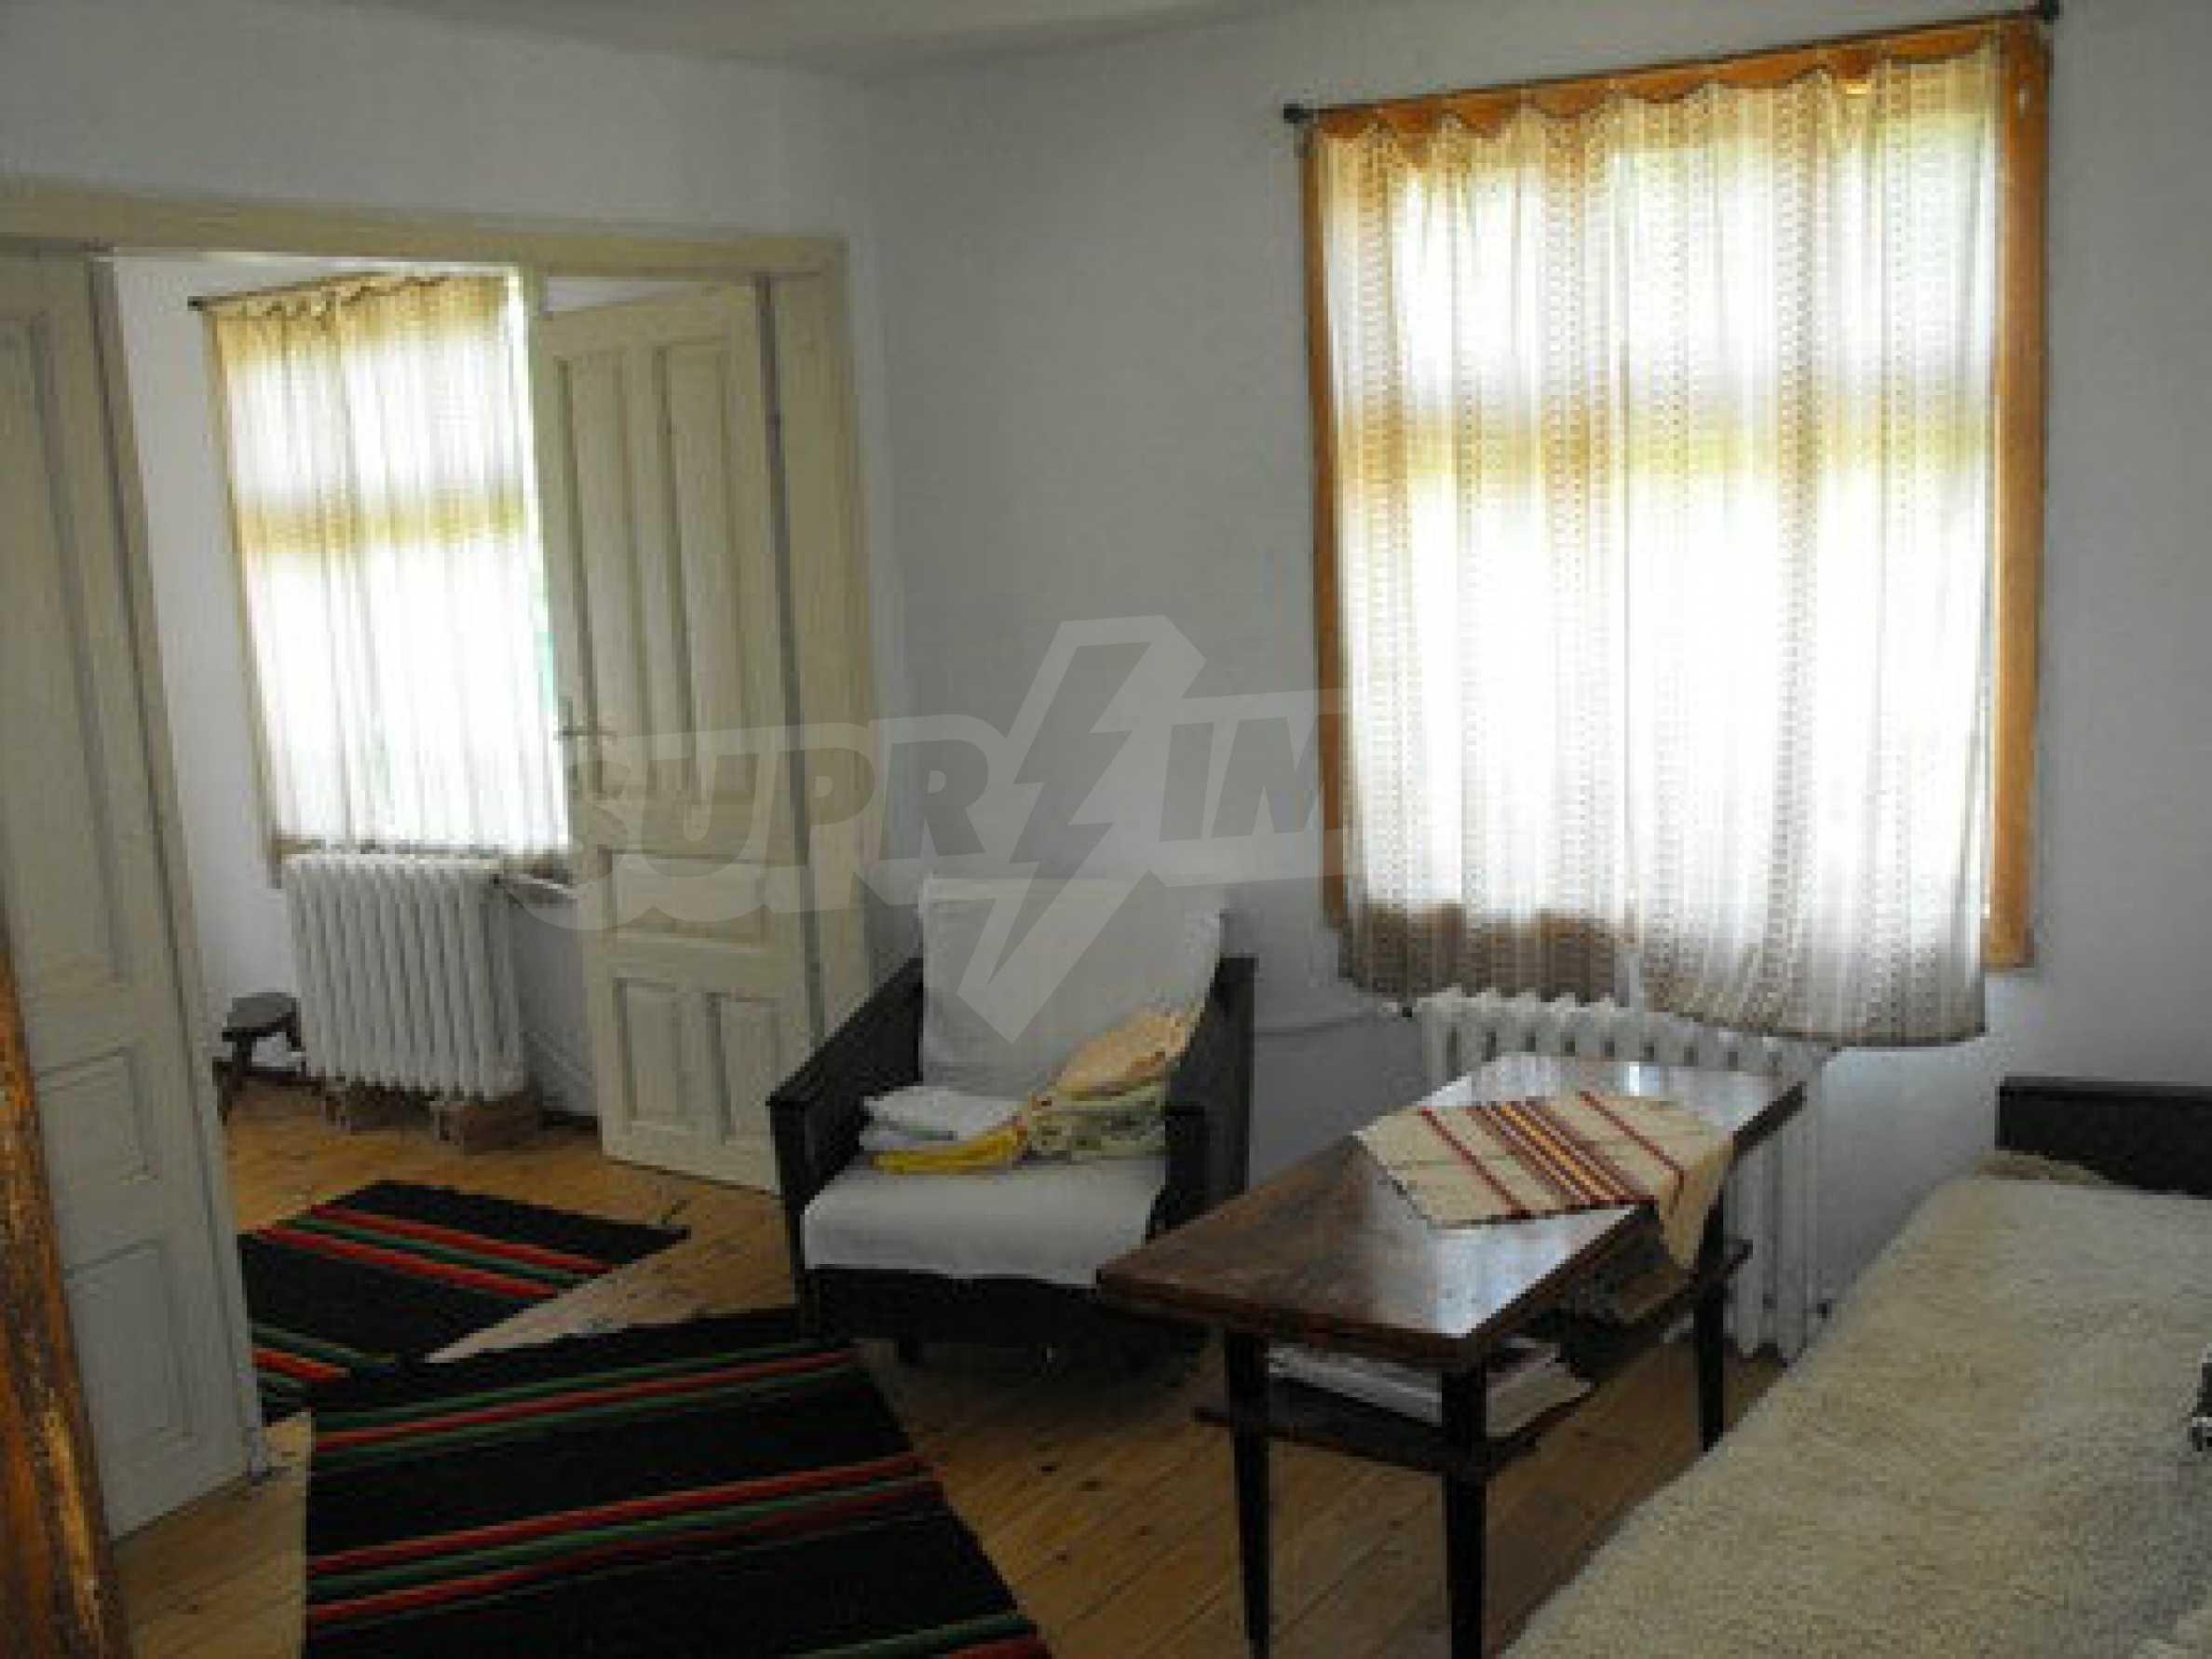 Revival House im Herzen des Balkans 22